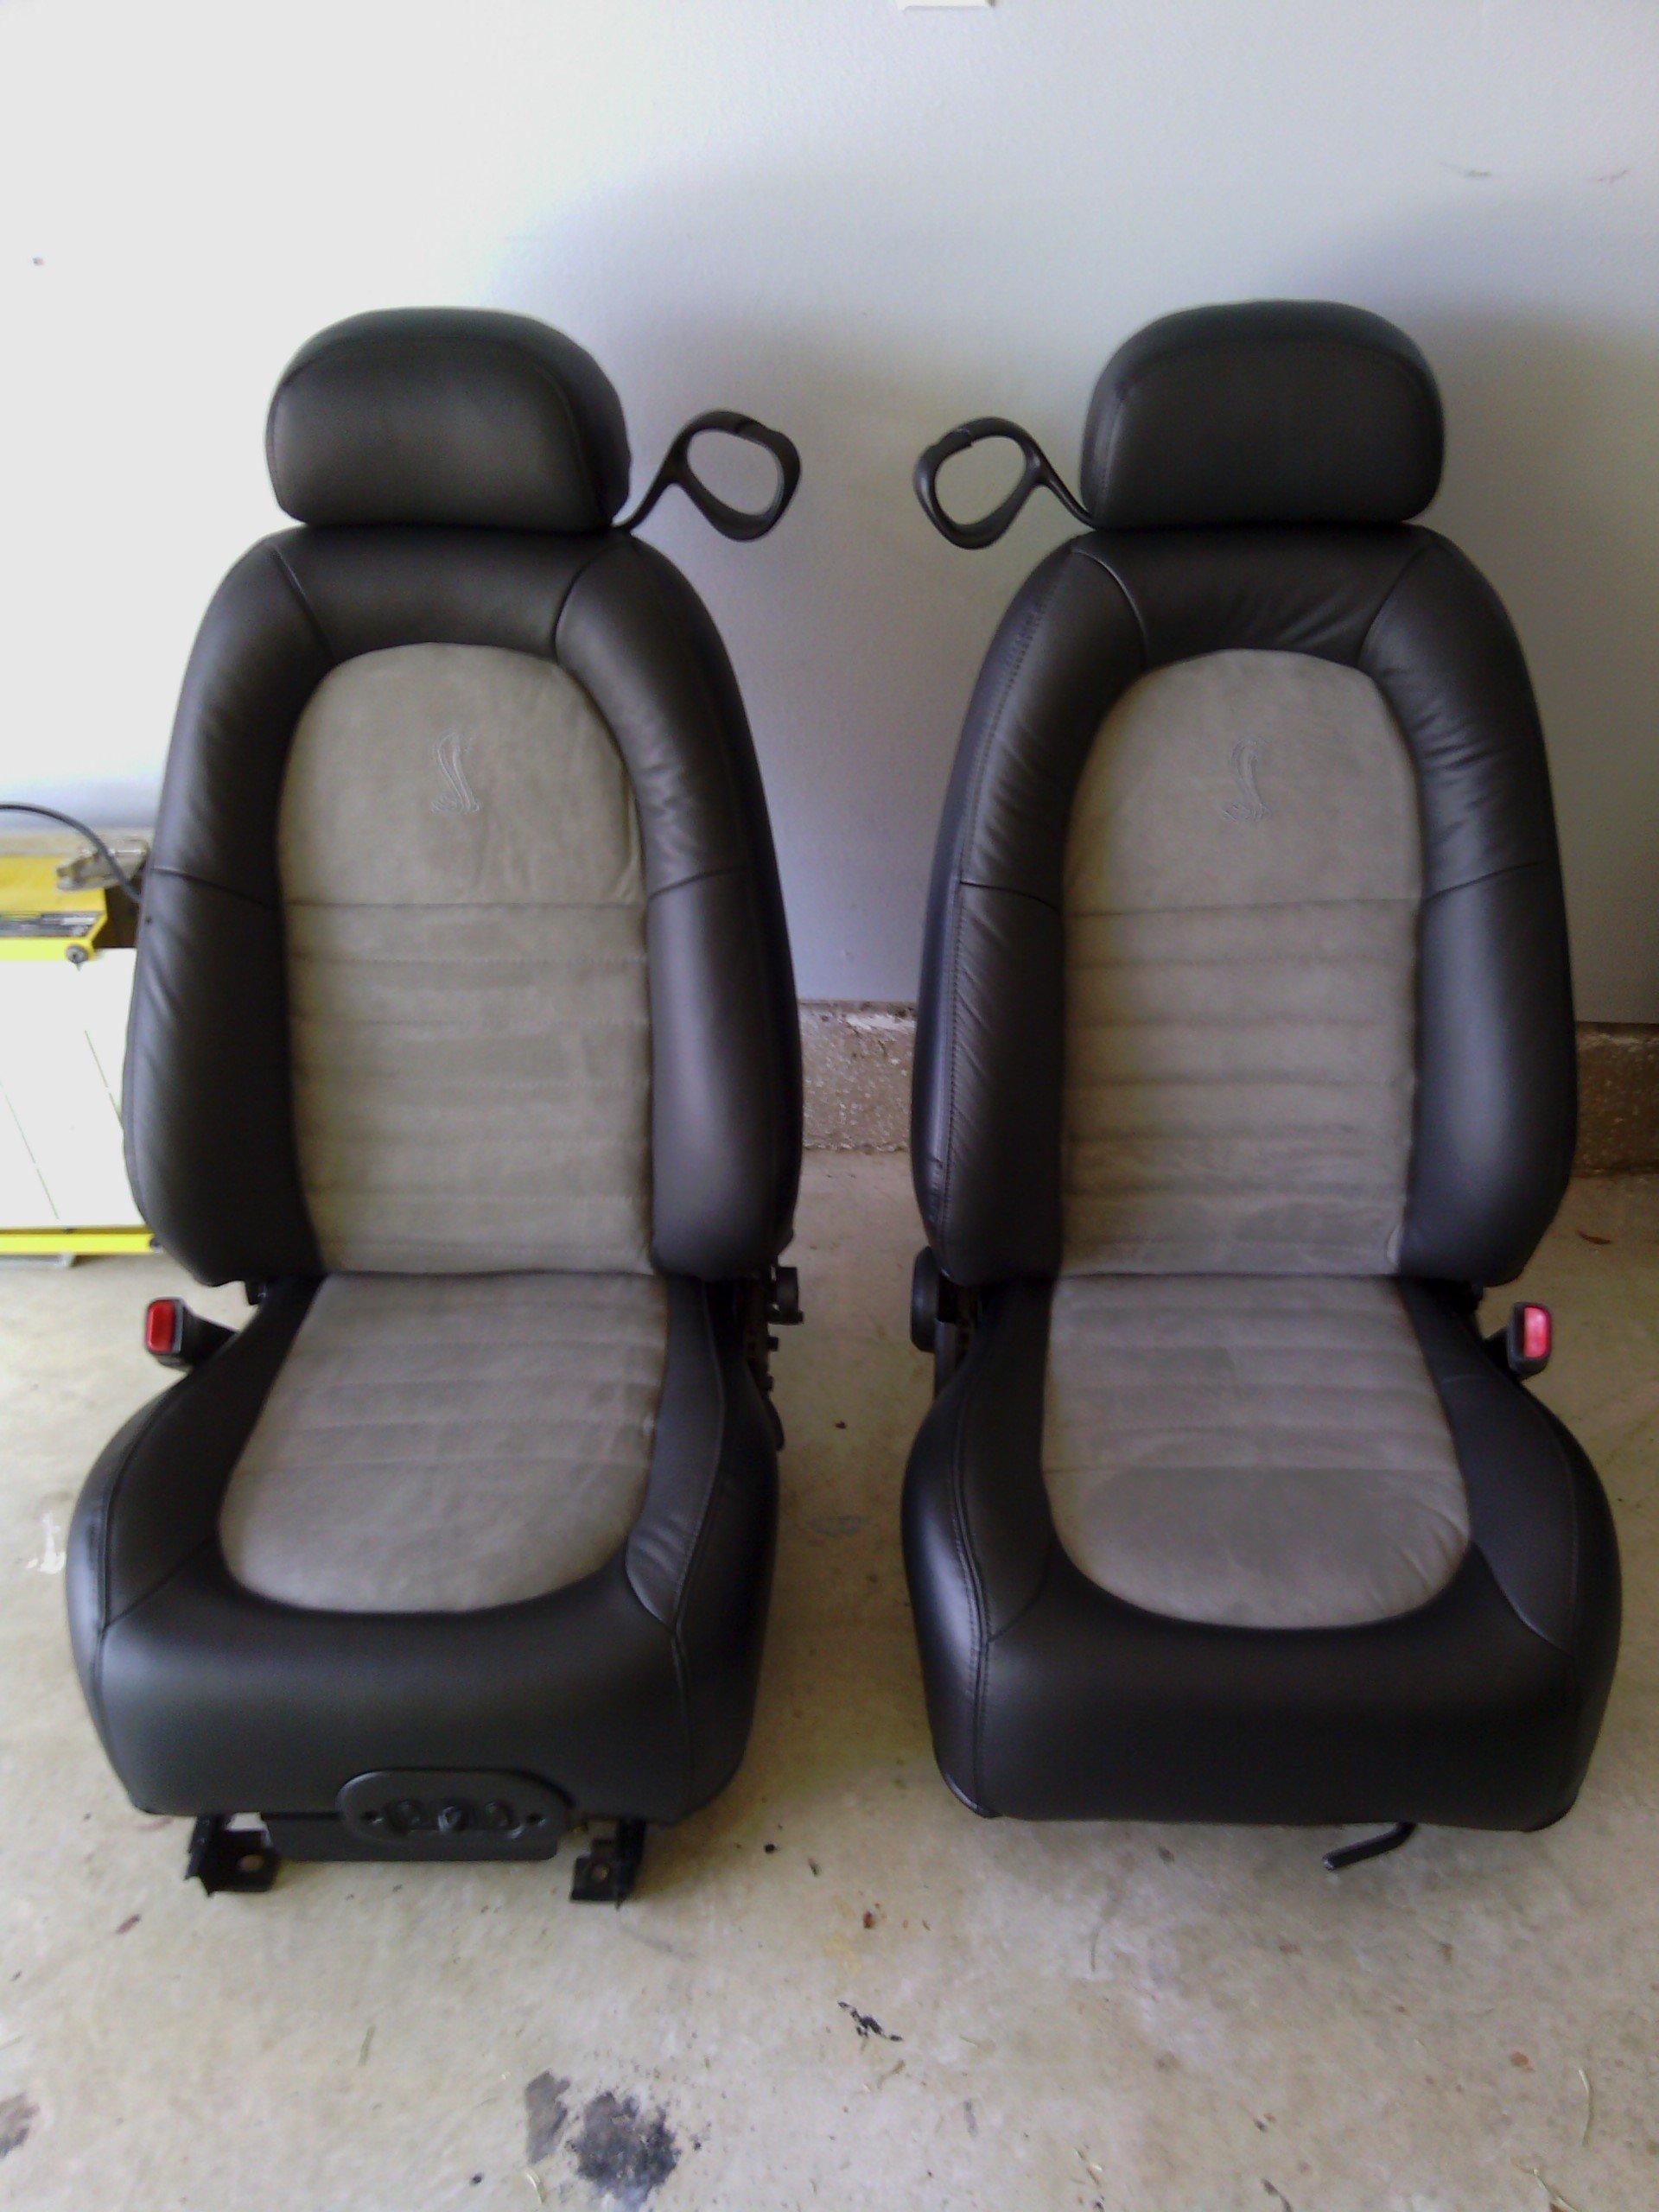 2001 cobra seats alcantara or unisuede img_20130721_111039 jpg